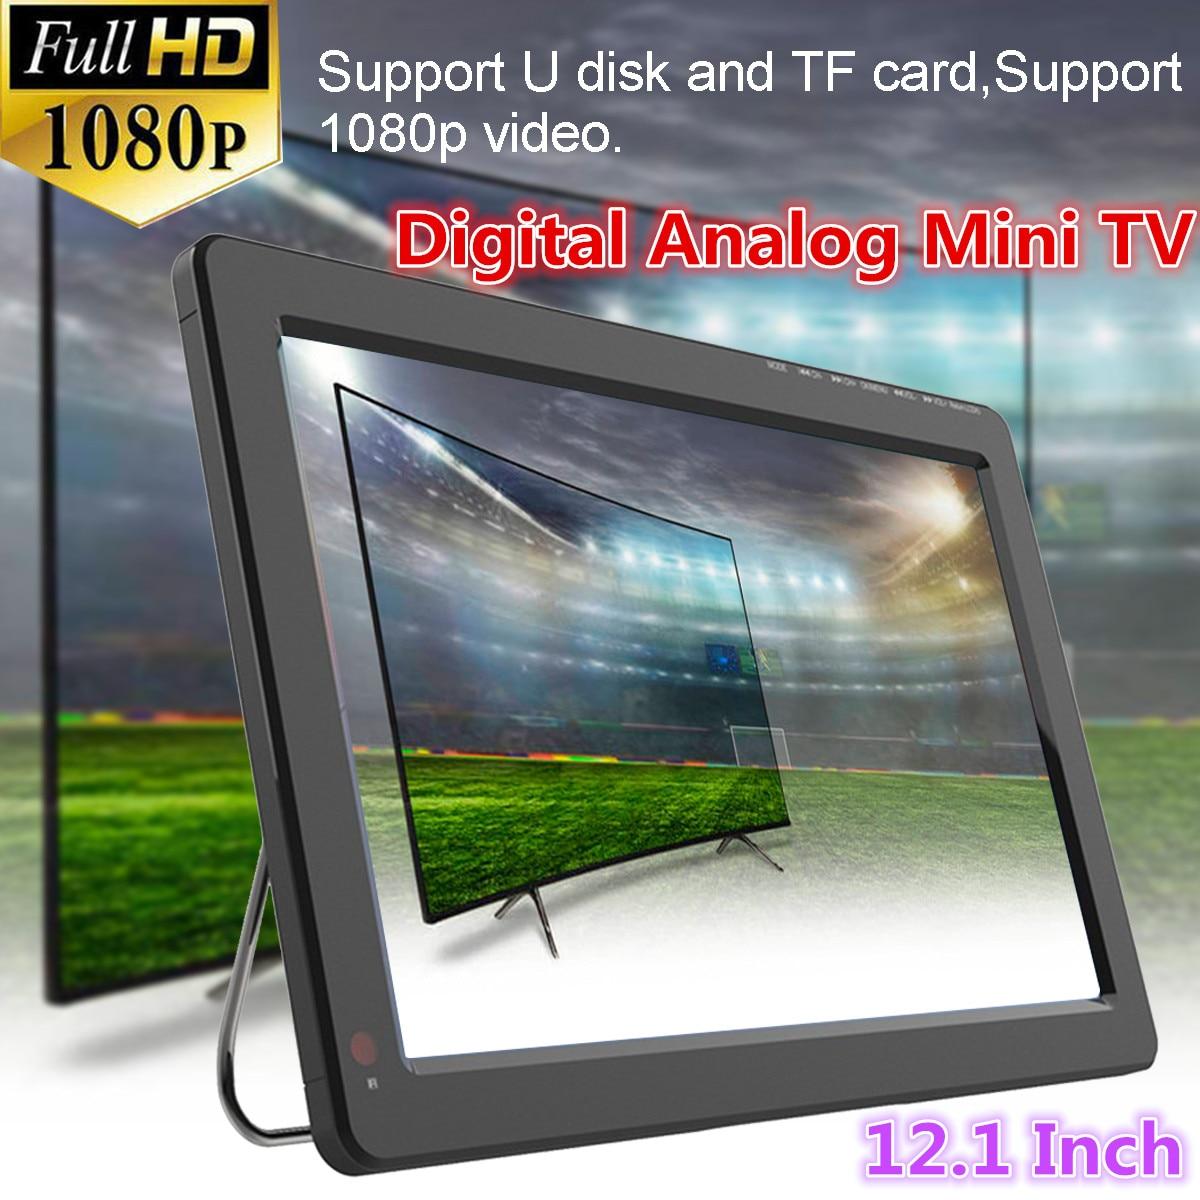 Mini TV analógica y Digital portátil para coche, de 12V y 18W, de 12,1 pulgadas, DVB-T / DVB-T2 TFT LED 1080P HD, admite tarjeta TF, Audio USB y enchufe europeo